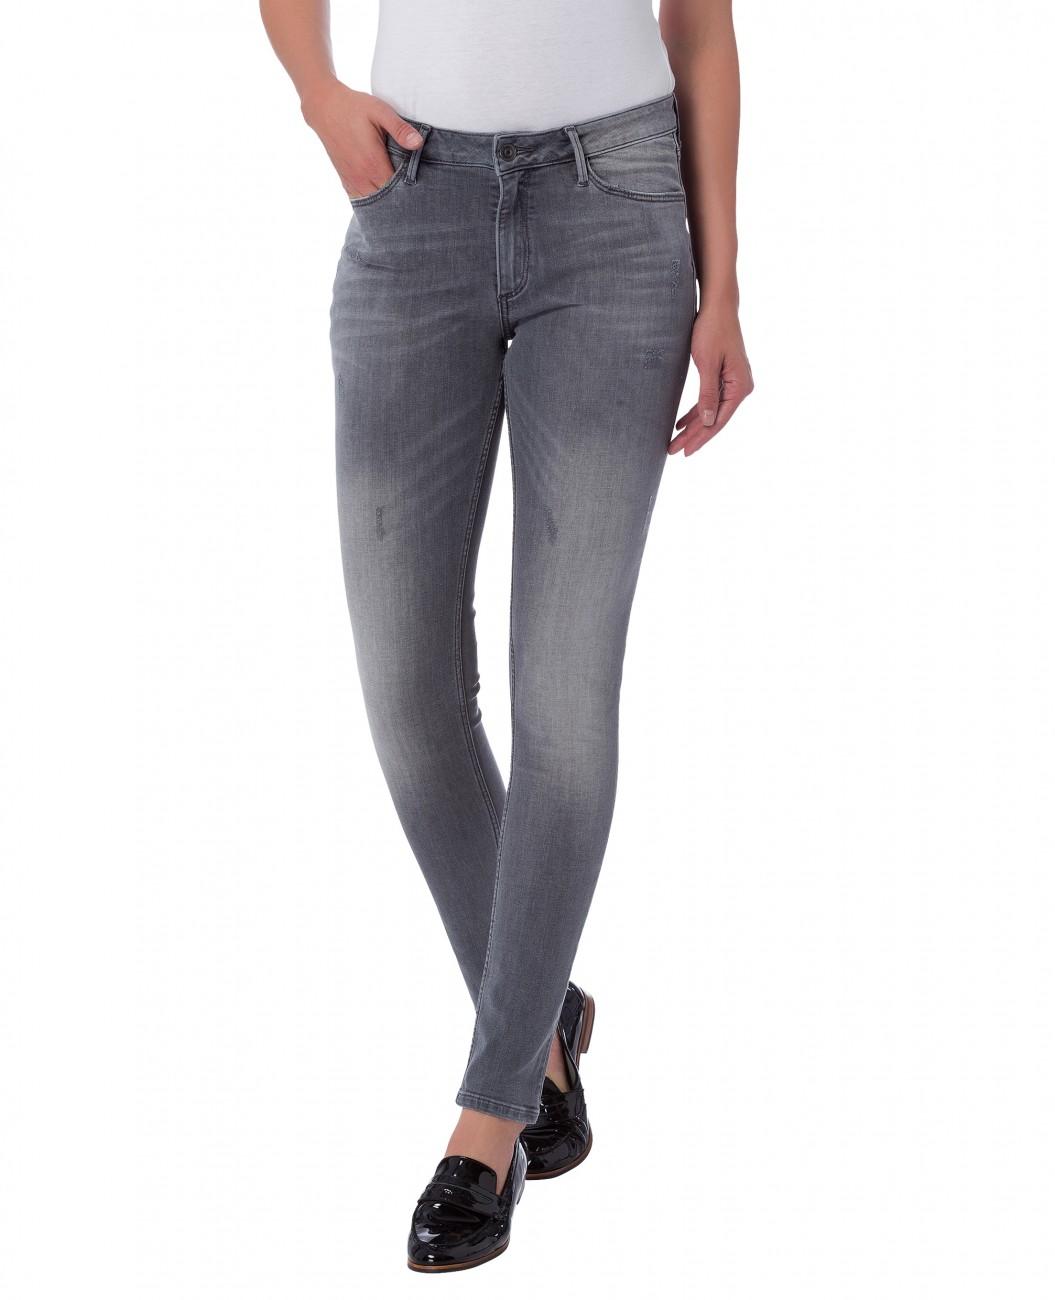 cross damen jeans alan skinny fit grau grey used kaufen jeans direct. Black Bedroom Furniture Sets. Home Design Ideas